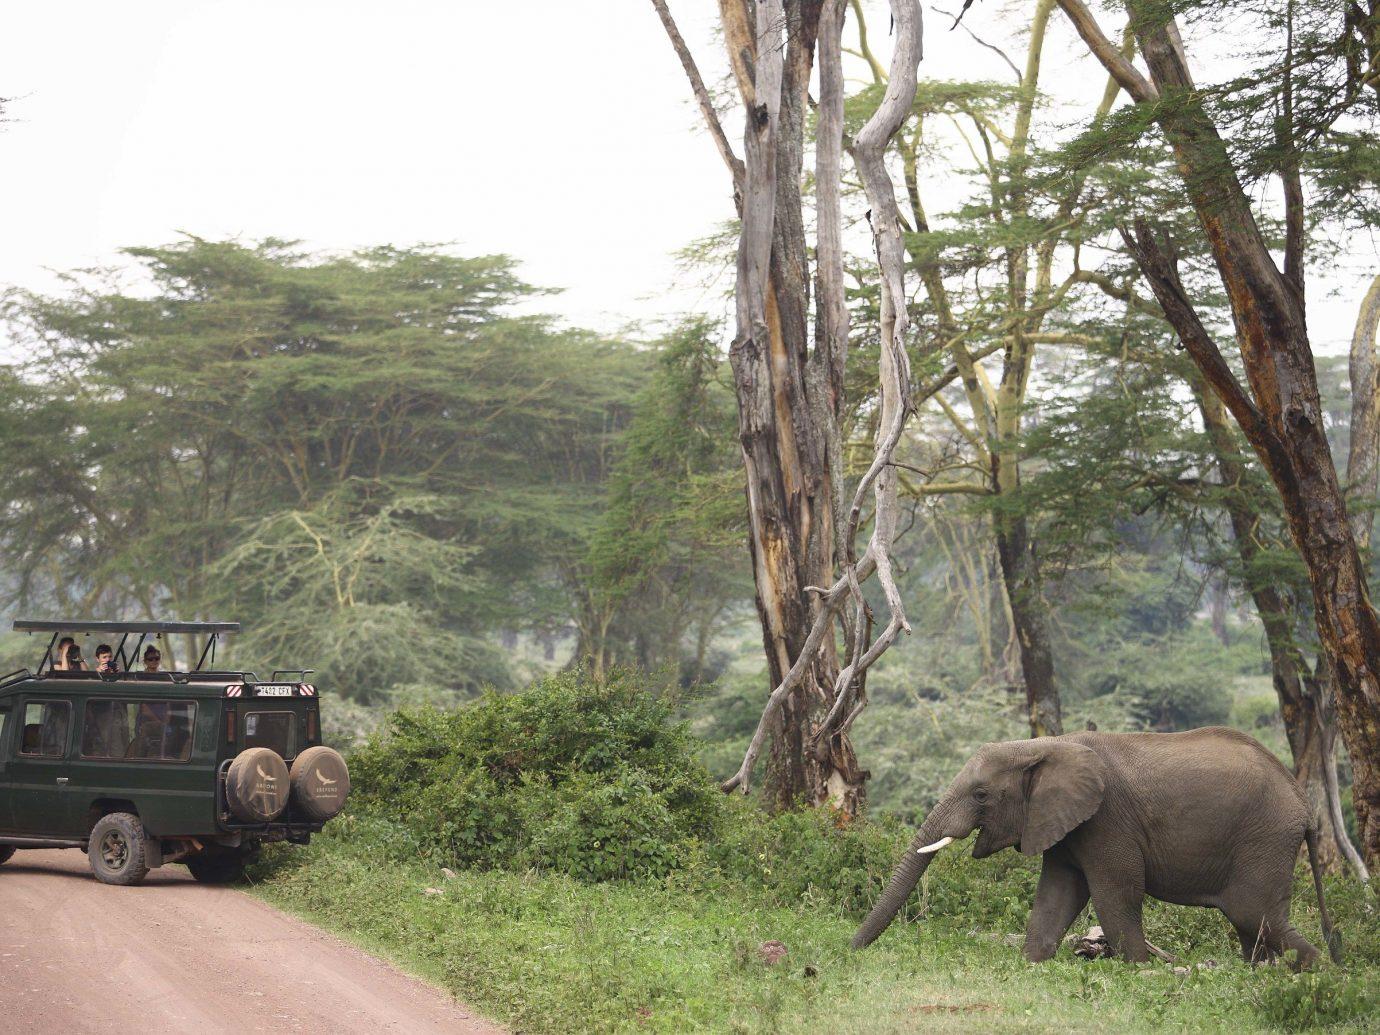 andBeyond Ngorongoro Crater Lodge, Tanzania African Safari Elephant